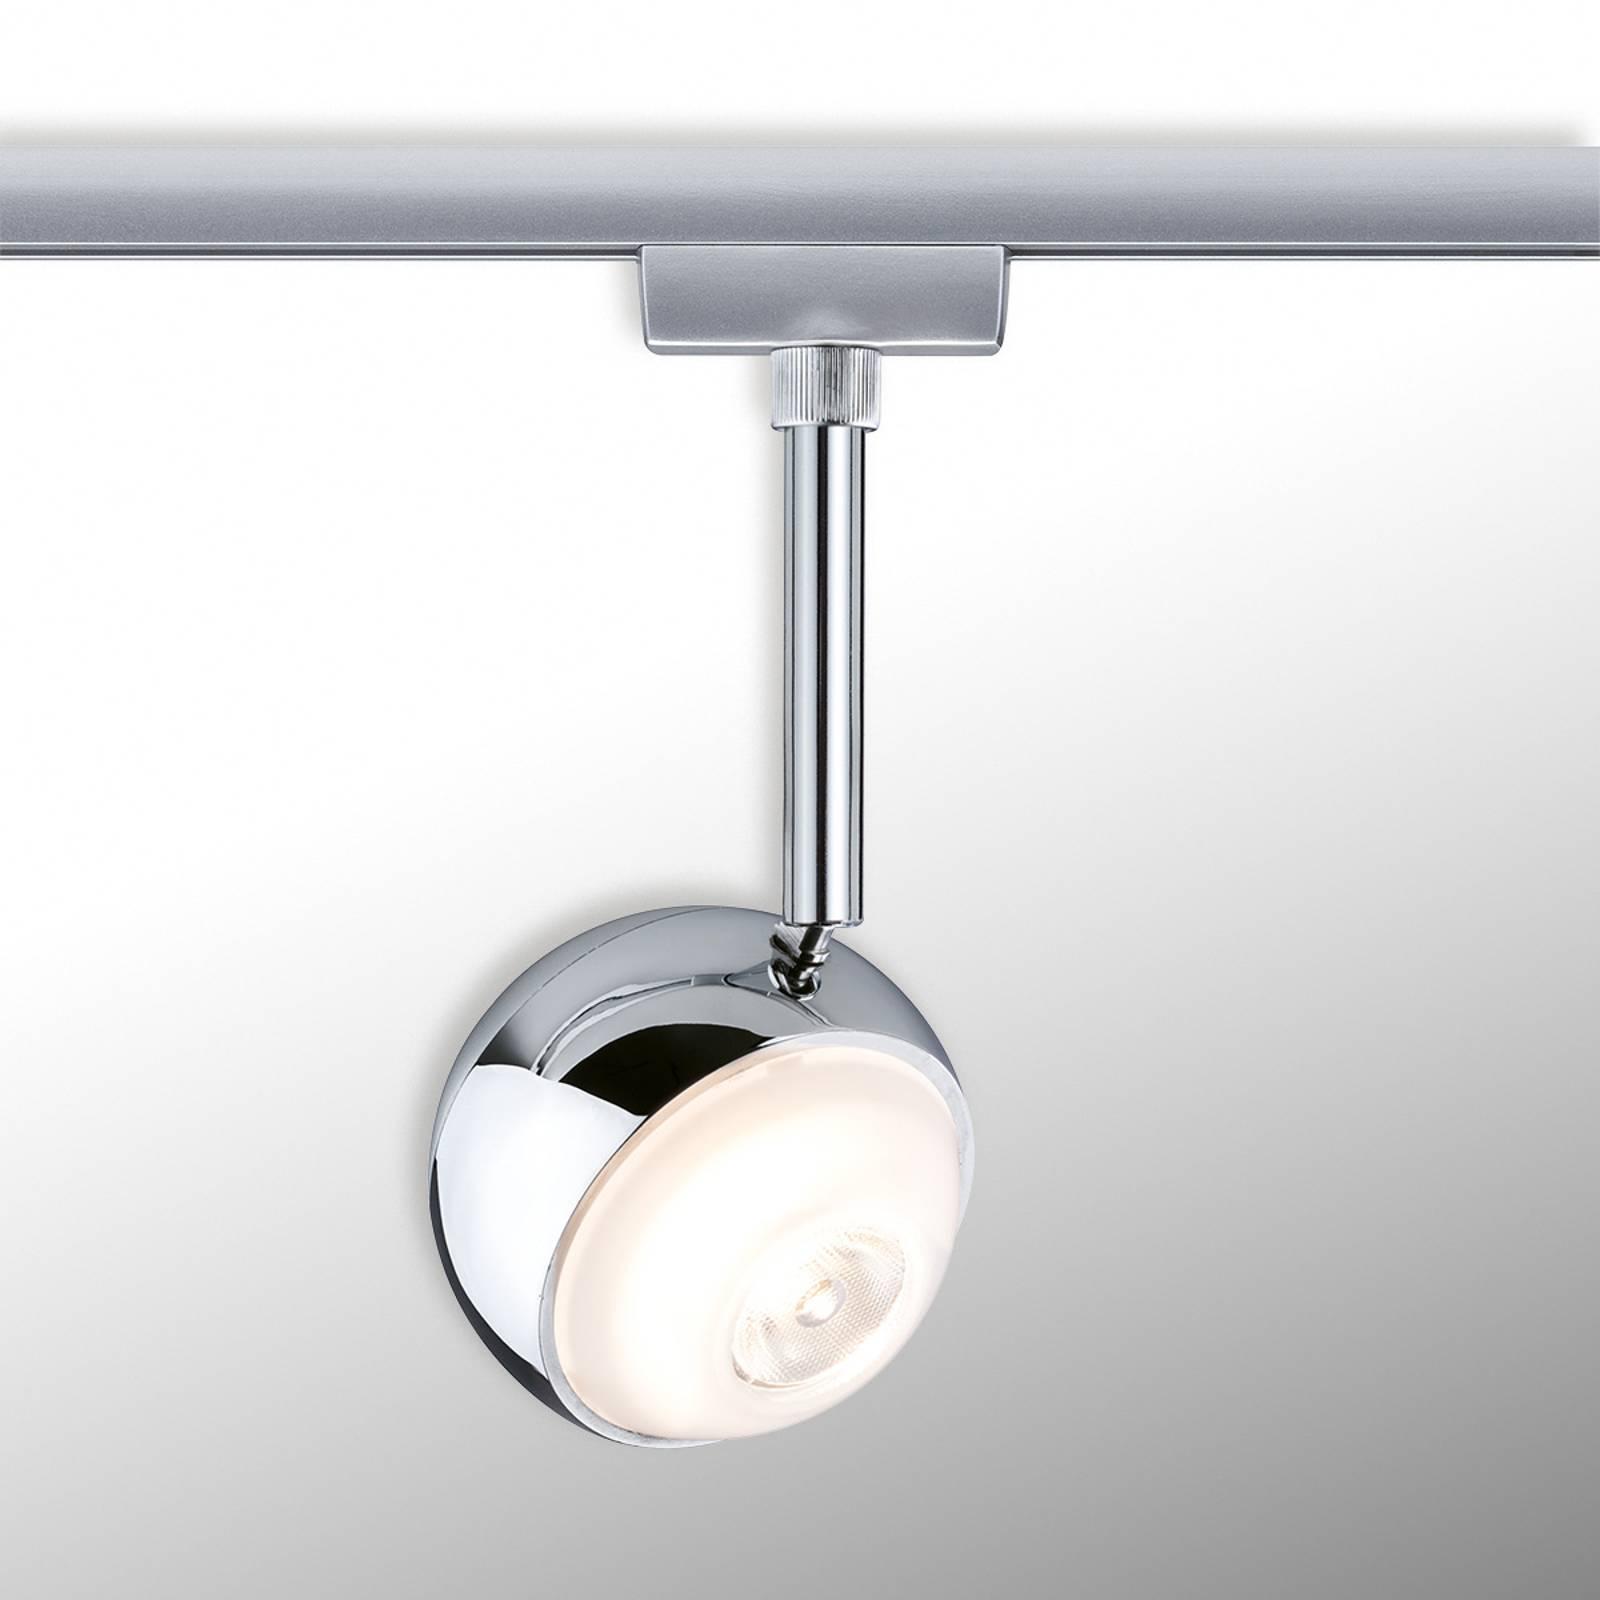 Paulmann URail Capsule -LED-spotti, kromi 6,5 W